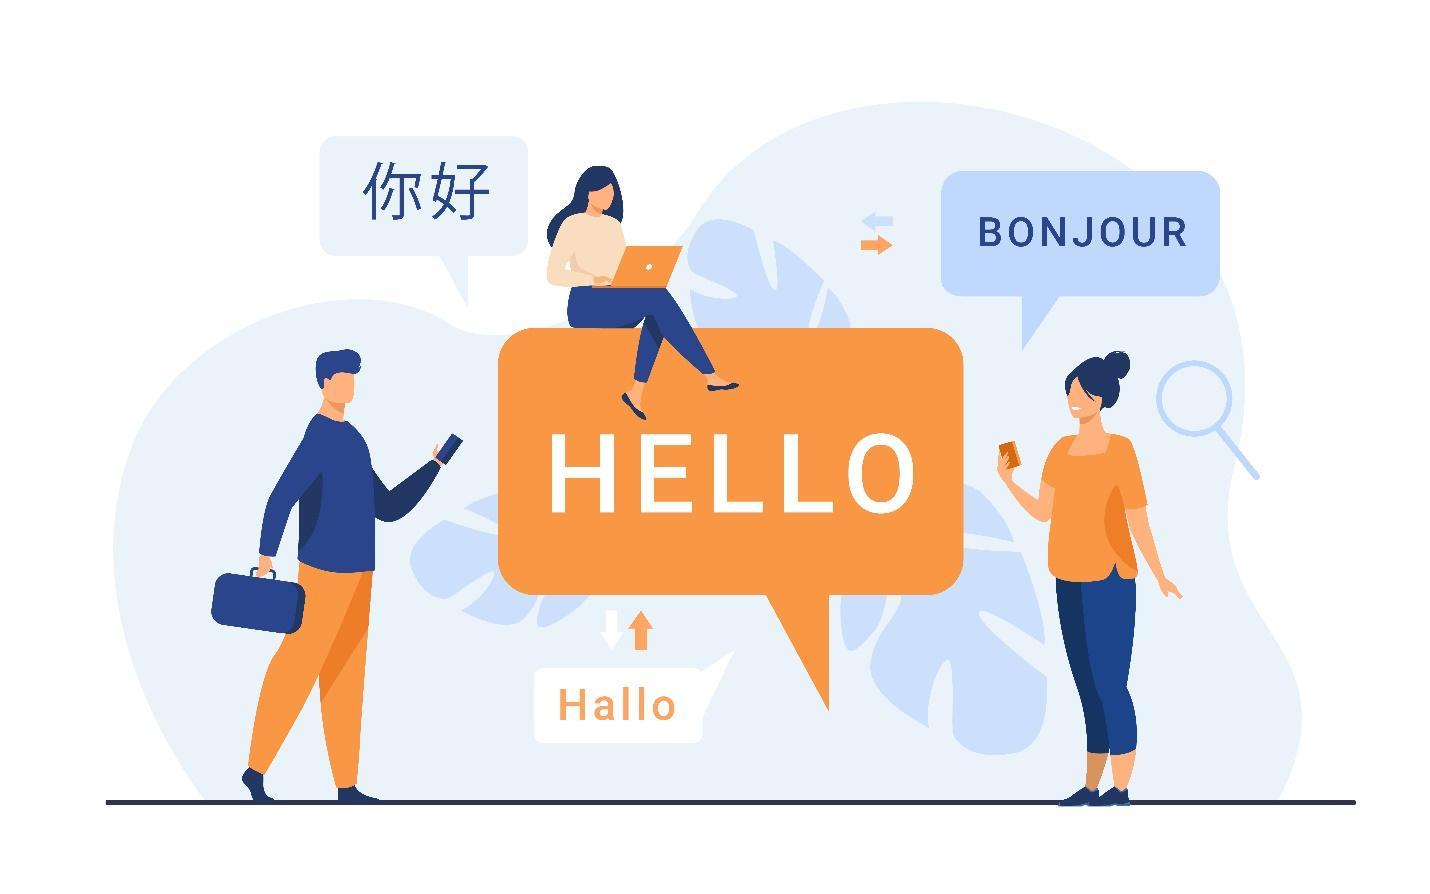 C:\Users\ASAD\Downloads\people-using-online-translation-app\Language.jpg